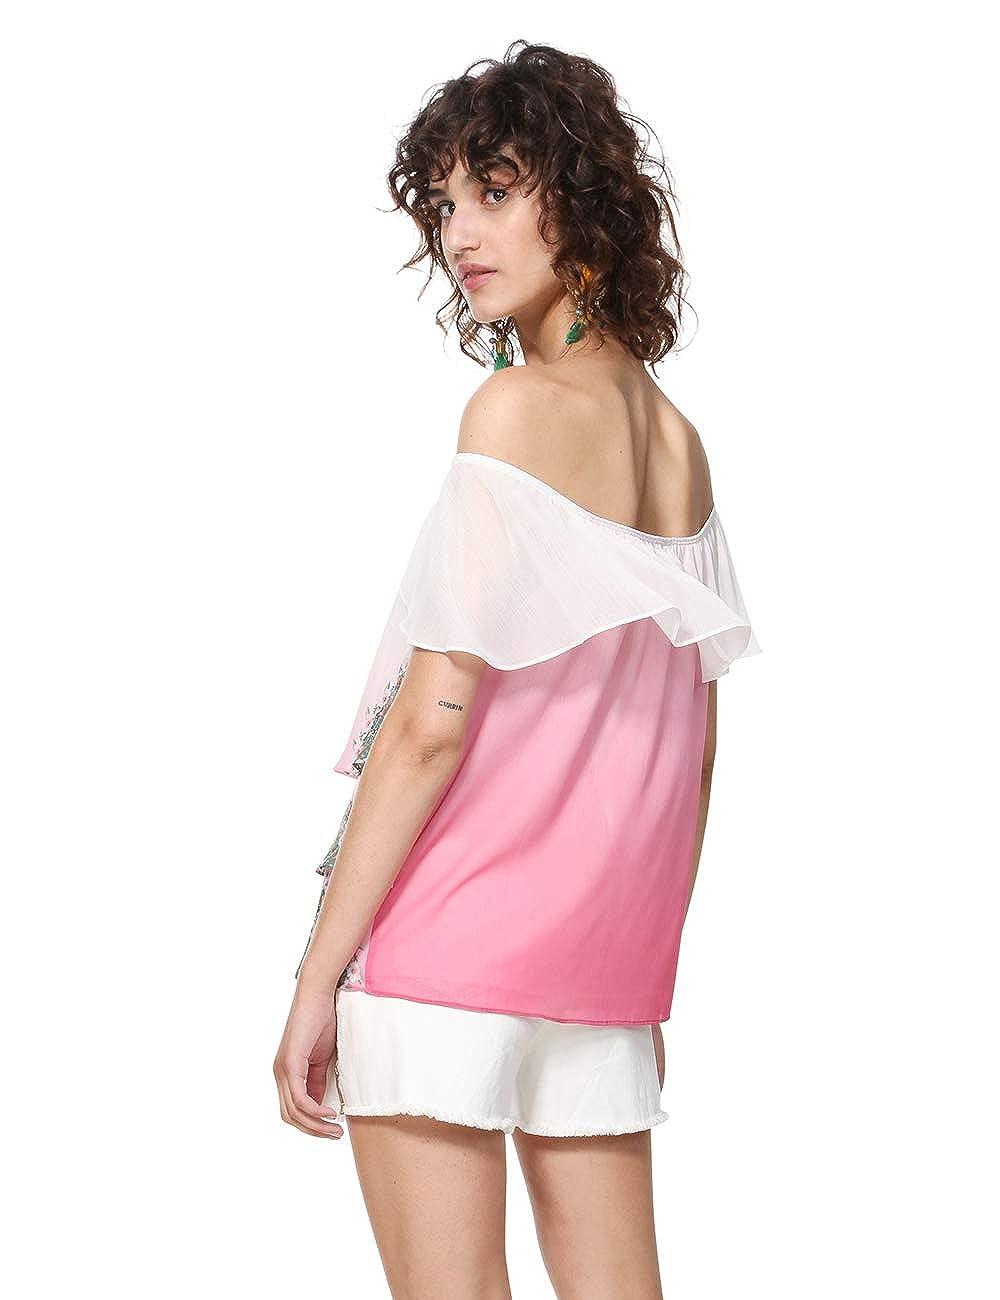 Desigual Blouse Sleeveless Alyssa Woman Pink Blusa Donna